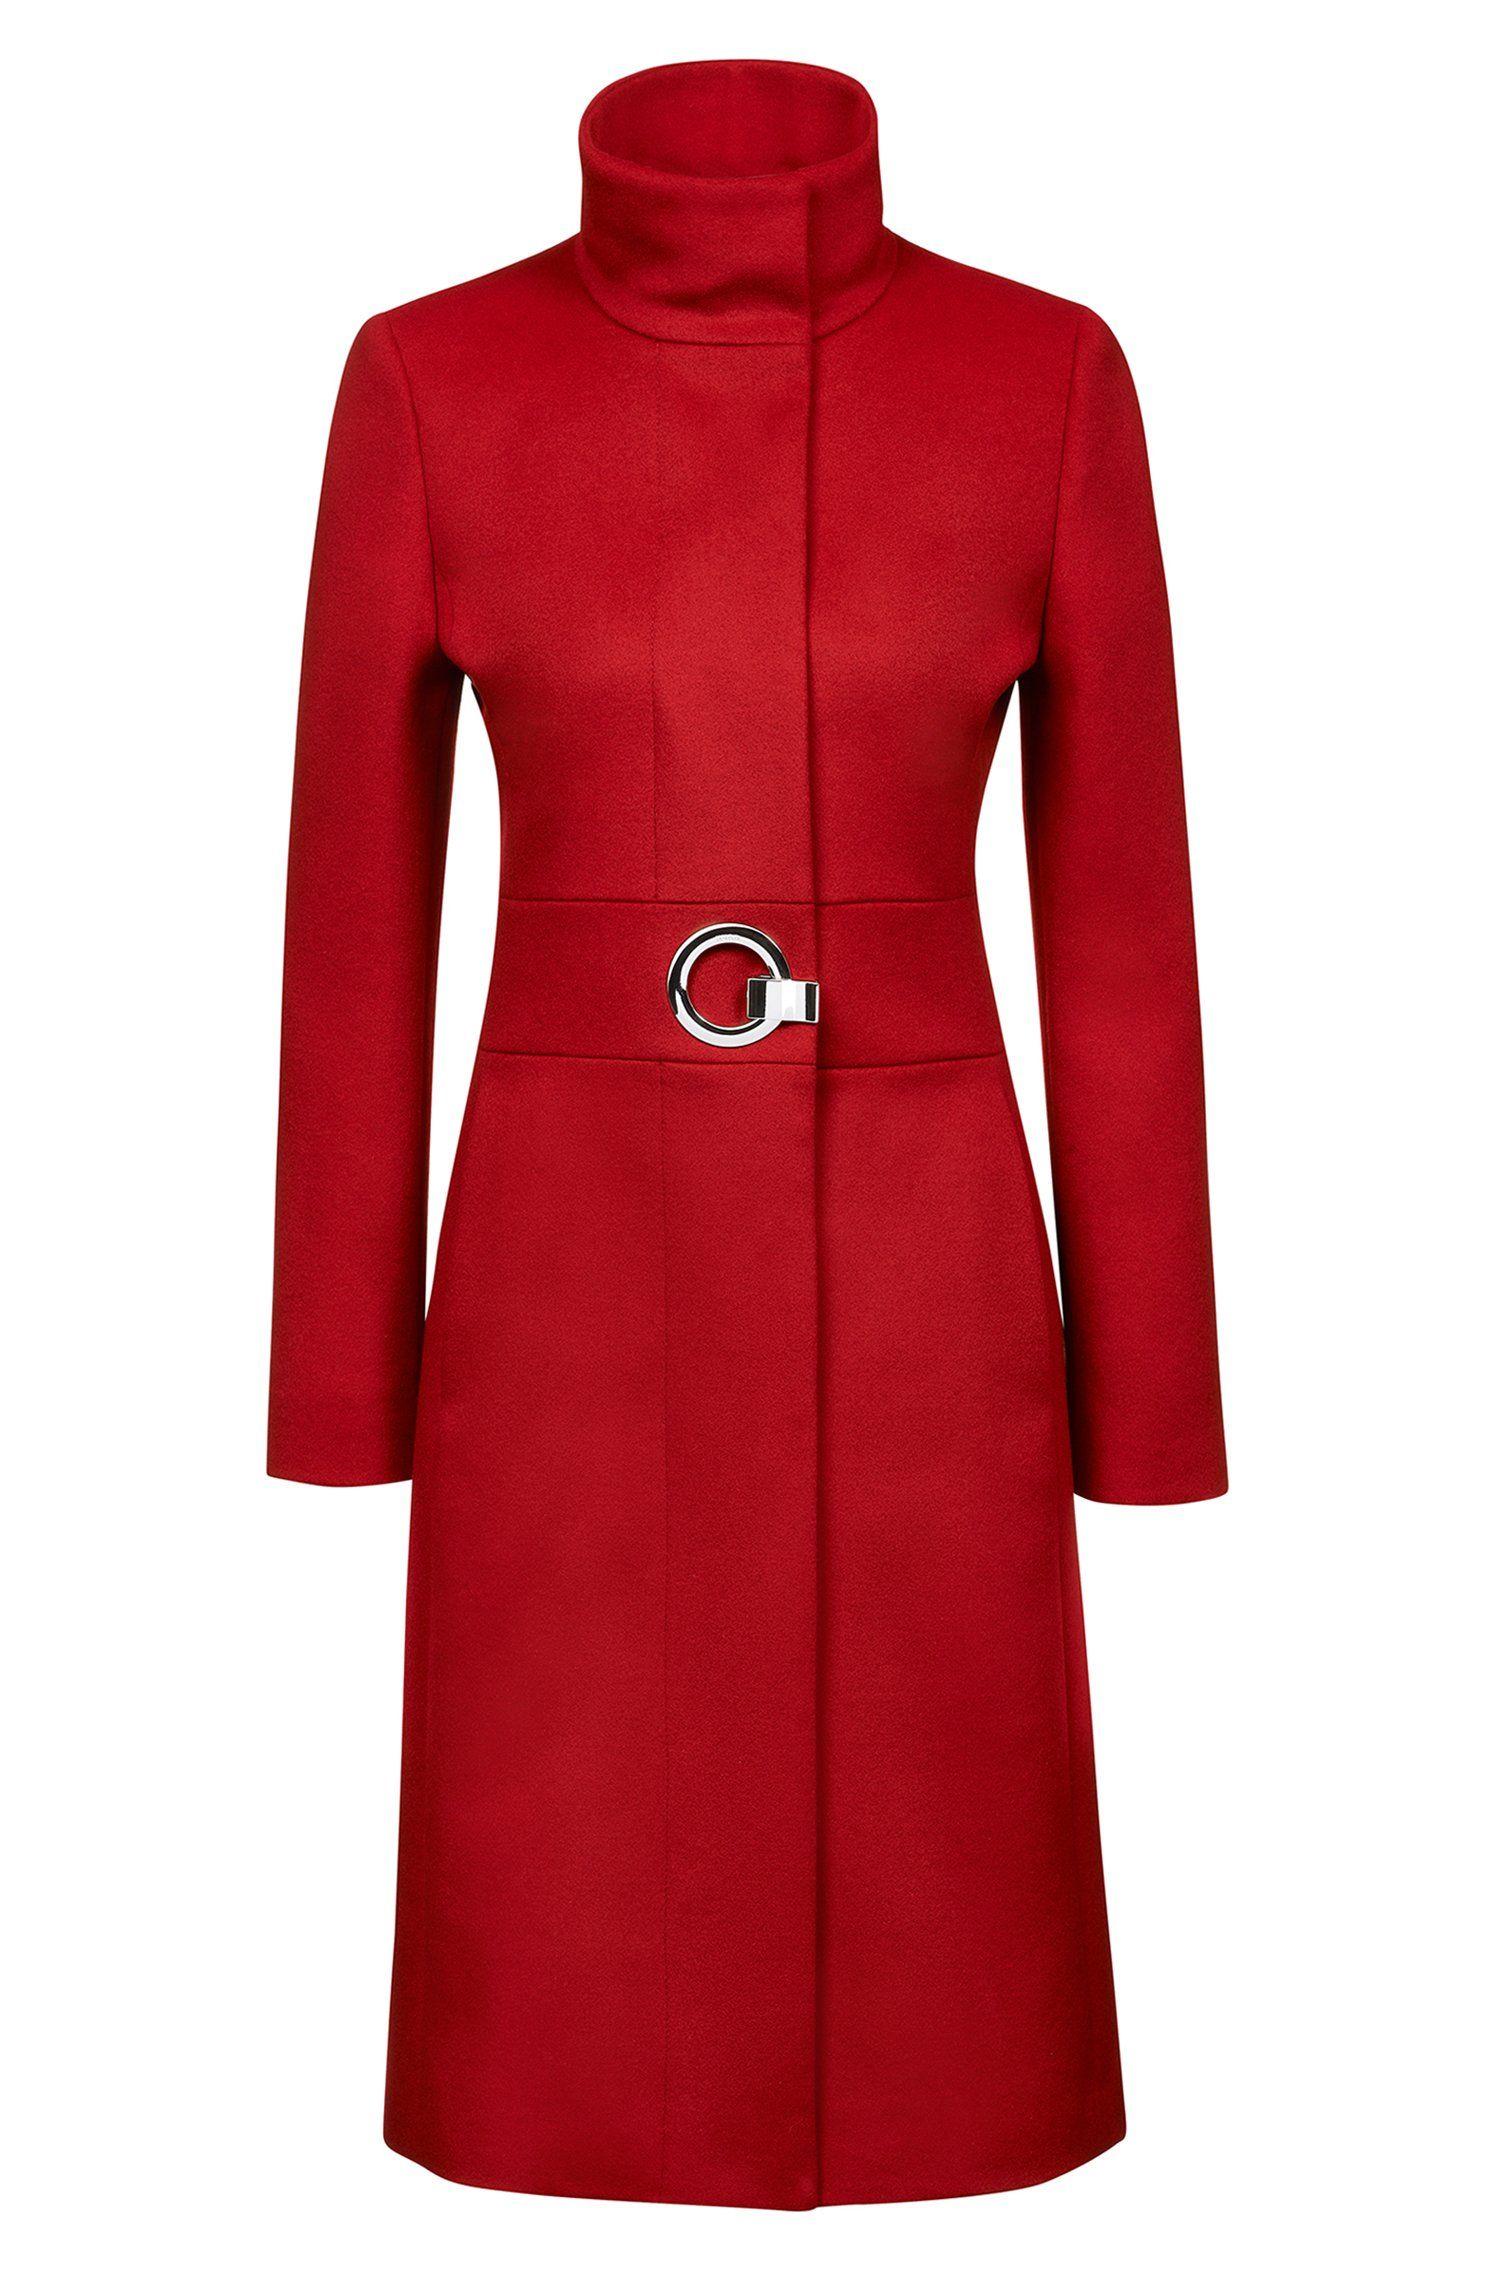 8ca0fa0efb9 HUGO - Regular-fit coat in a virgin wool blend